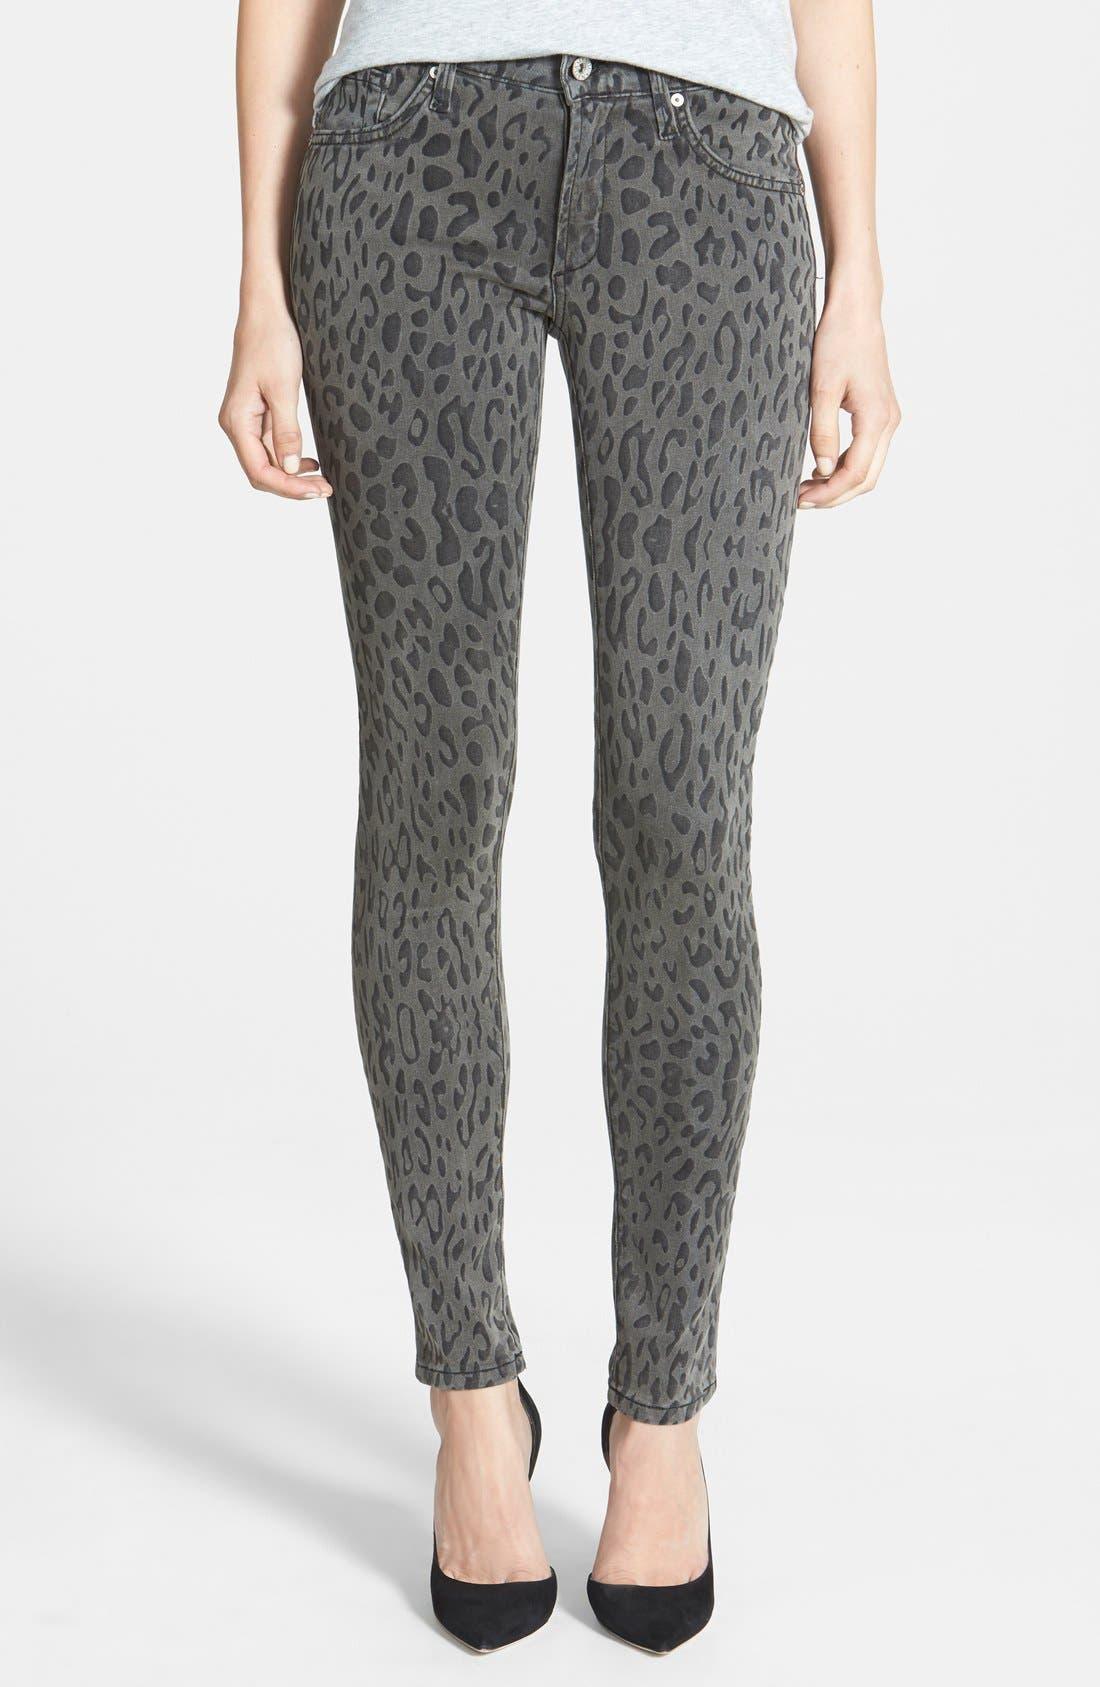 Alternate Image 1 Selected - James Jeans Five Pocket Leggings (Cougar)